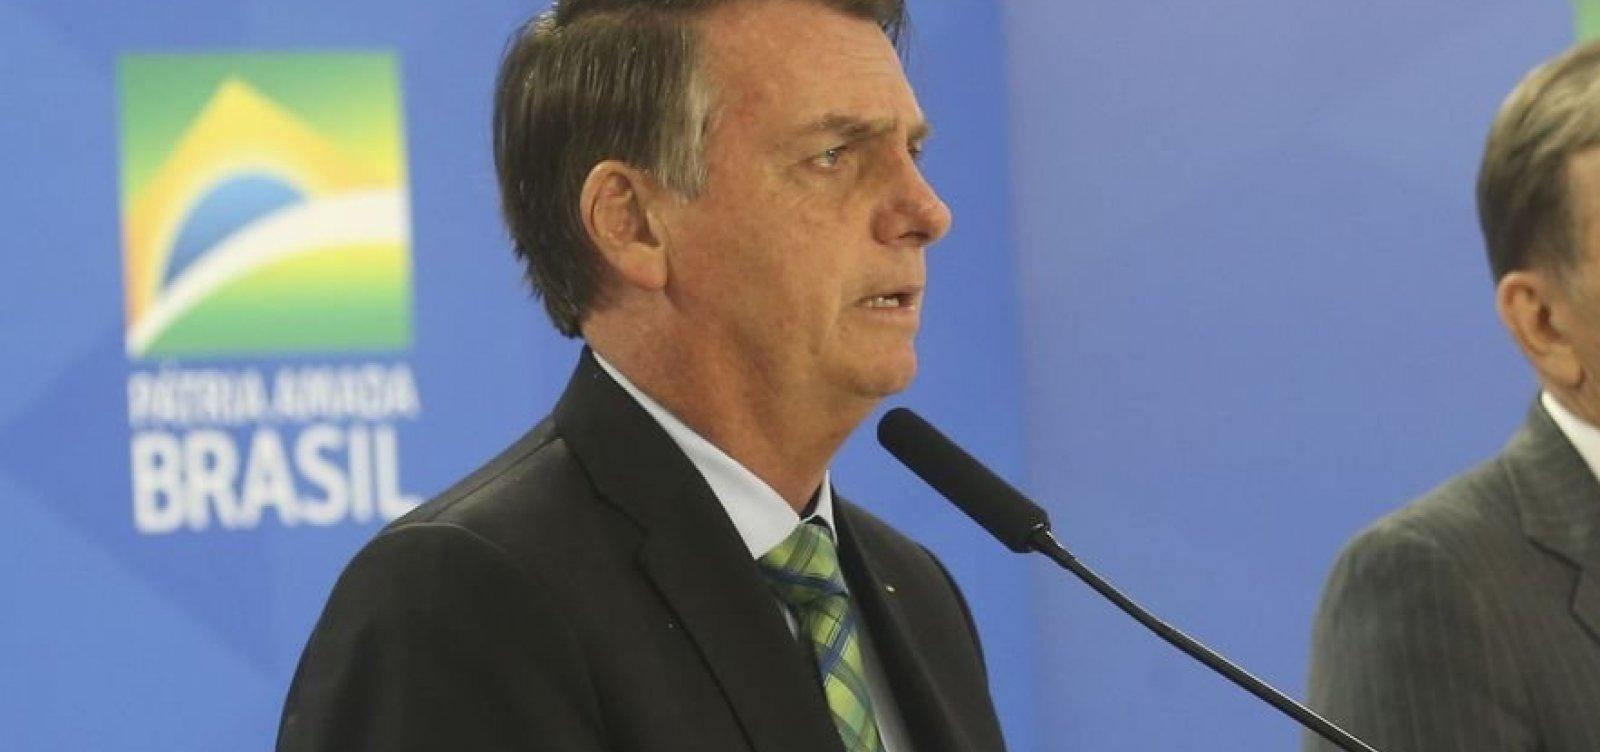 Brasil vive democracia, mas crises na América do Sul preocupam, diz Bolsonaro